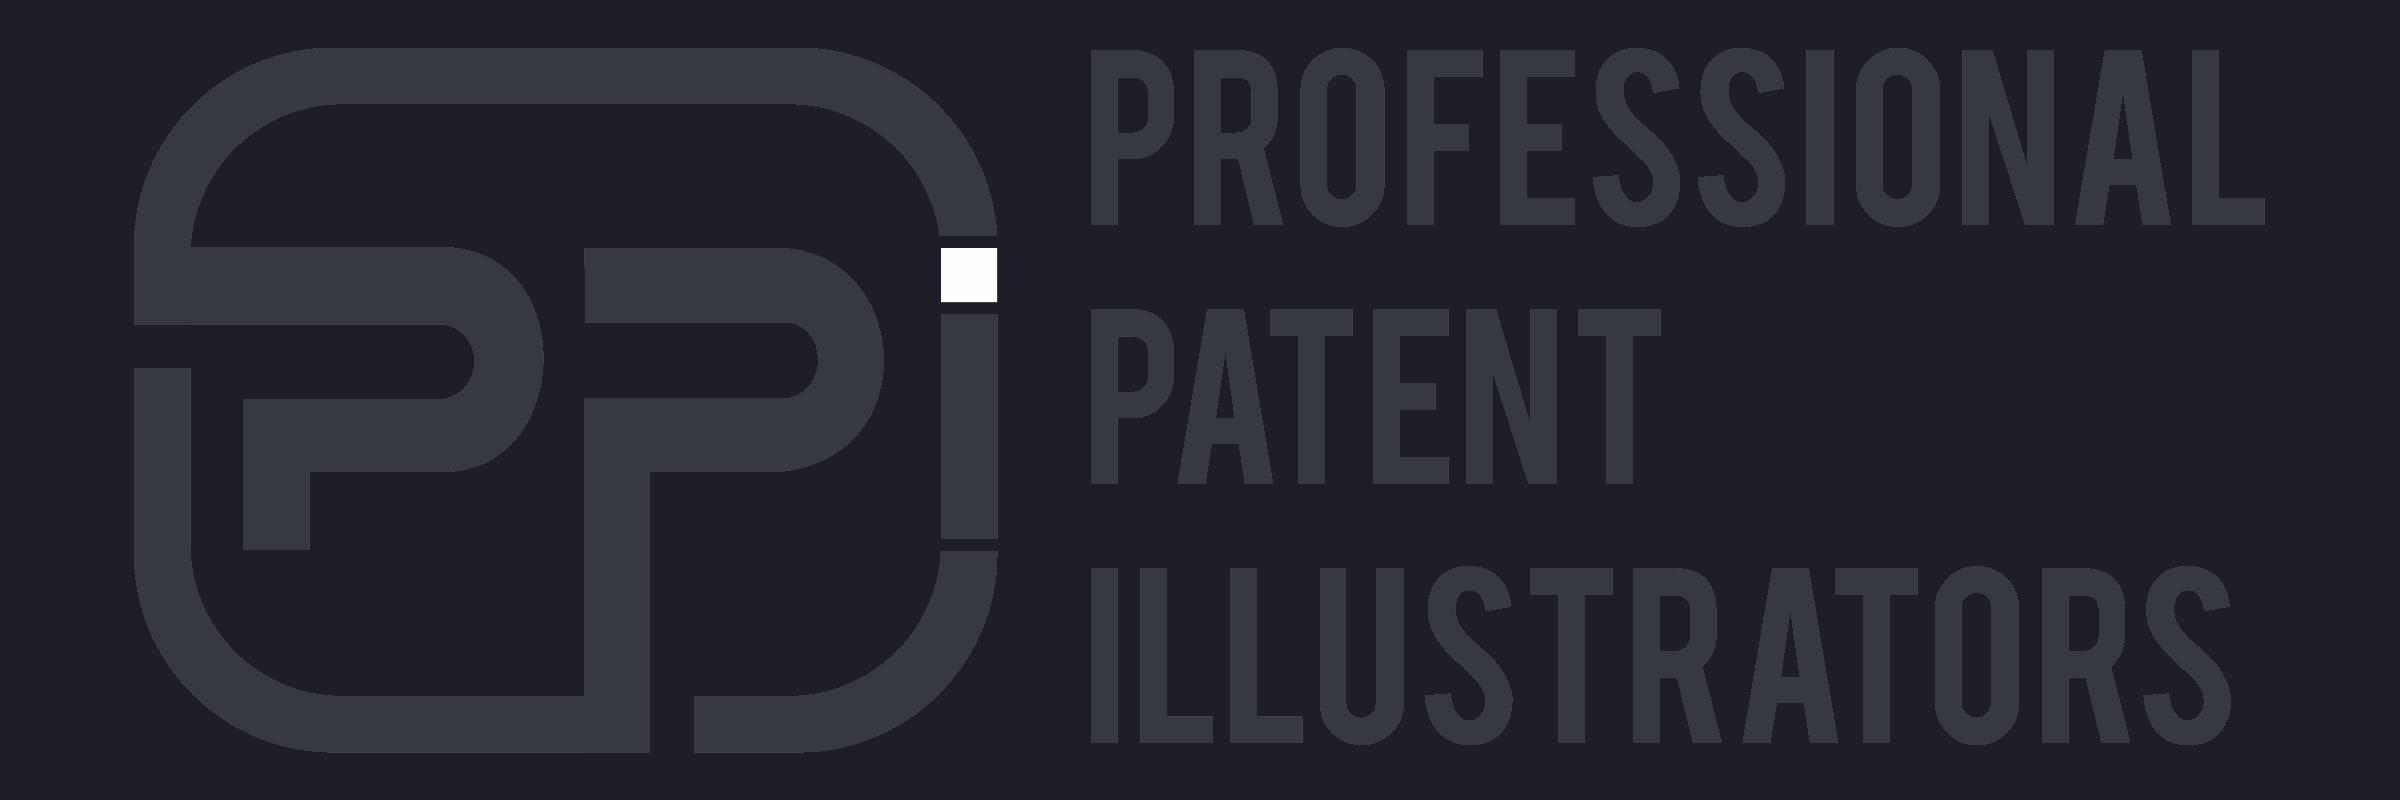 Professional Patent Illustrators Logo